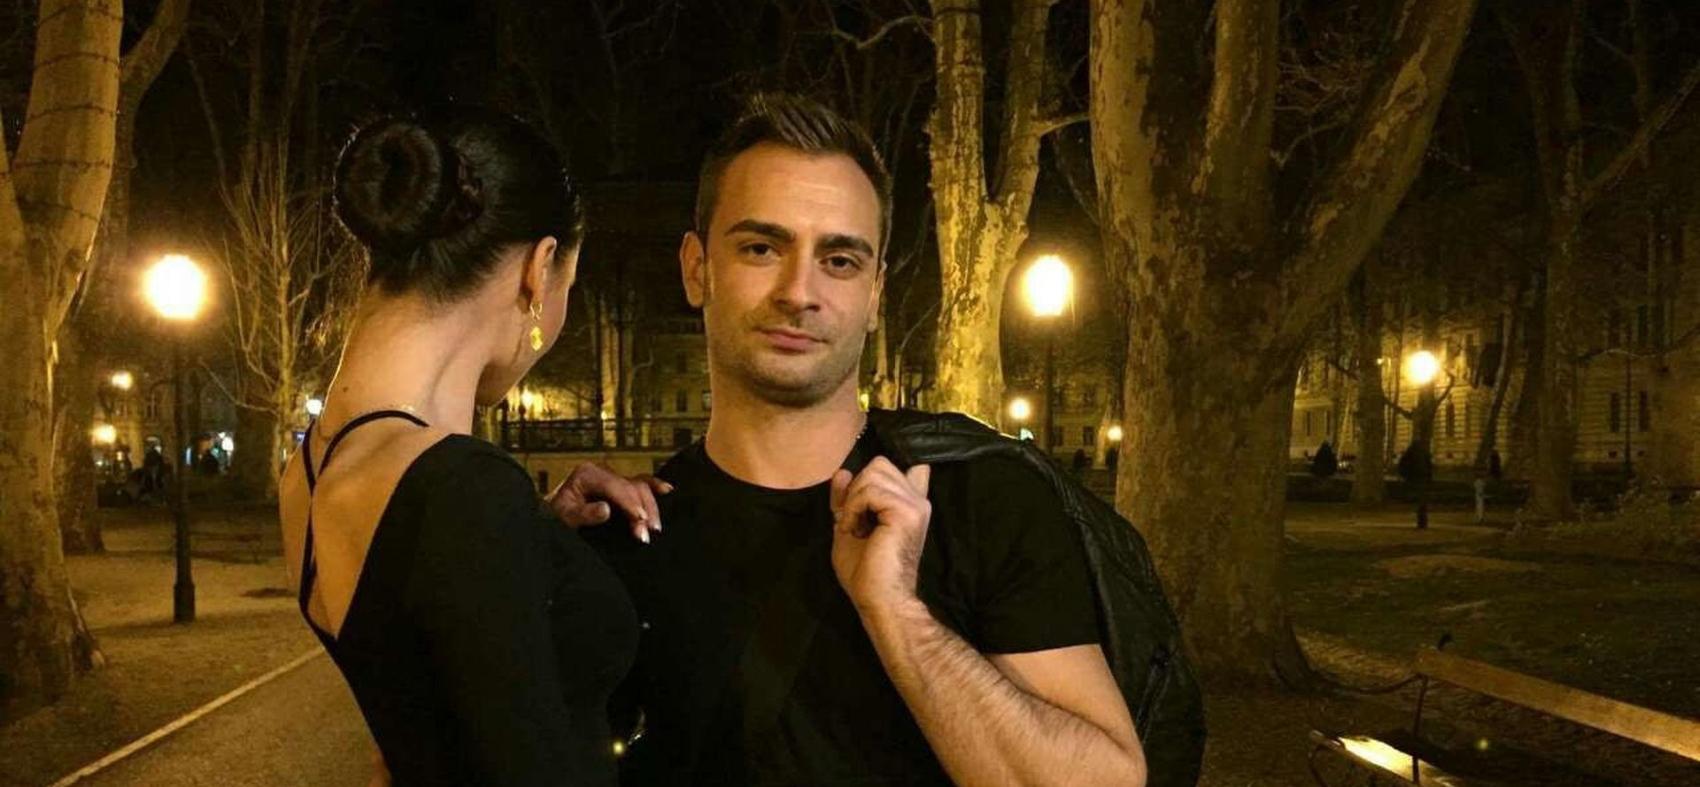 FOTO: VIDEO: Jelena Katarina Kapa u video spotu zagrebačkog benda 'Ljubavnici'